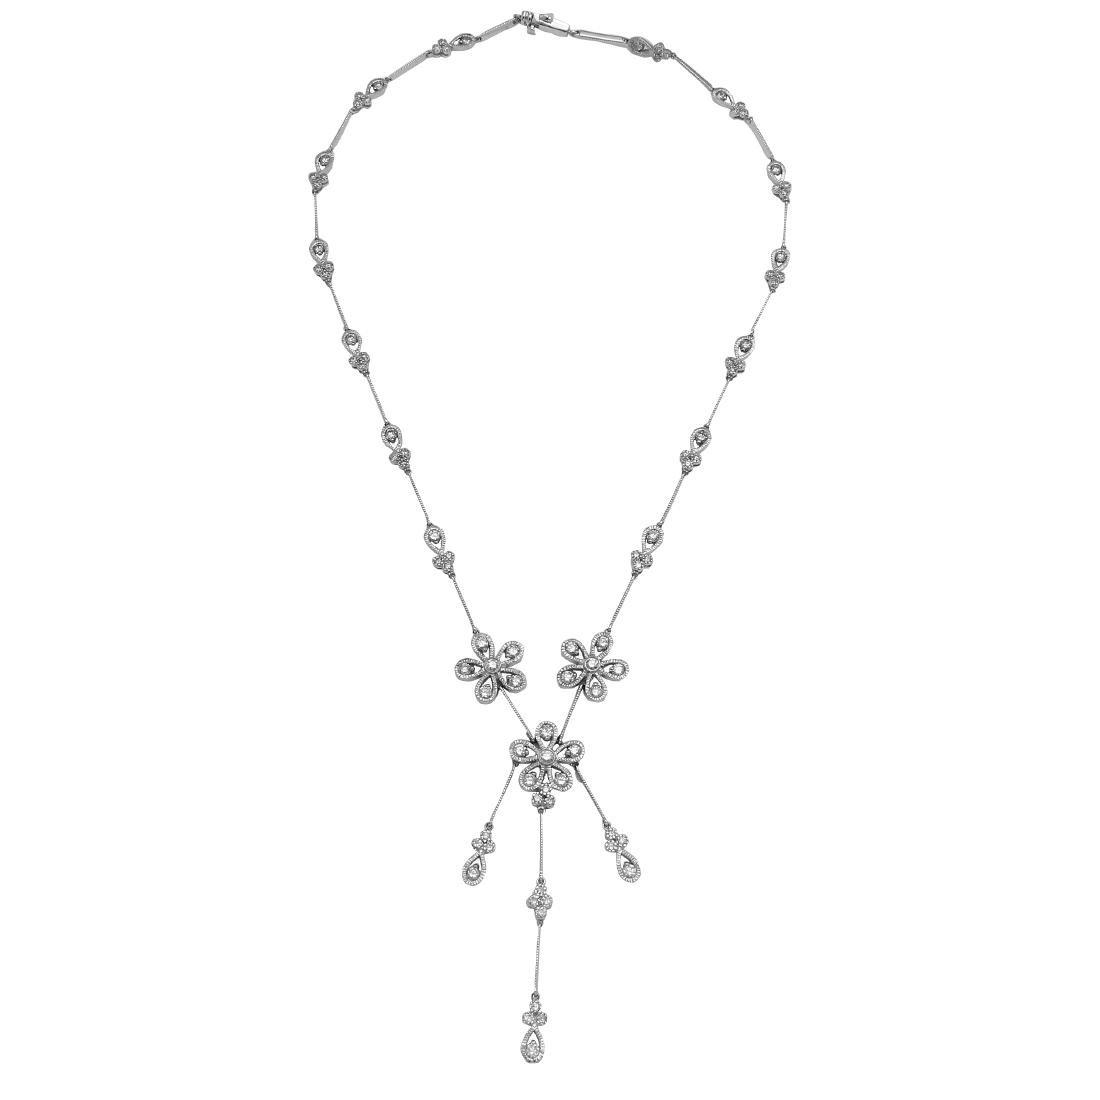 14KT White Gold Diamond Flower Necklace